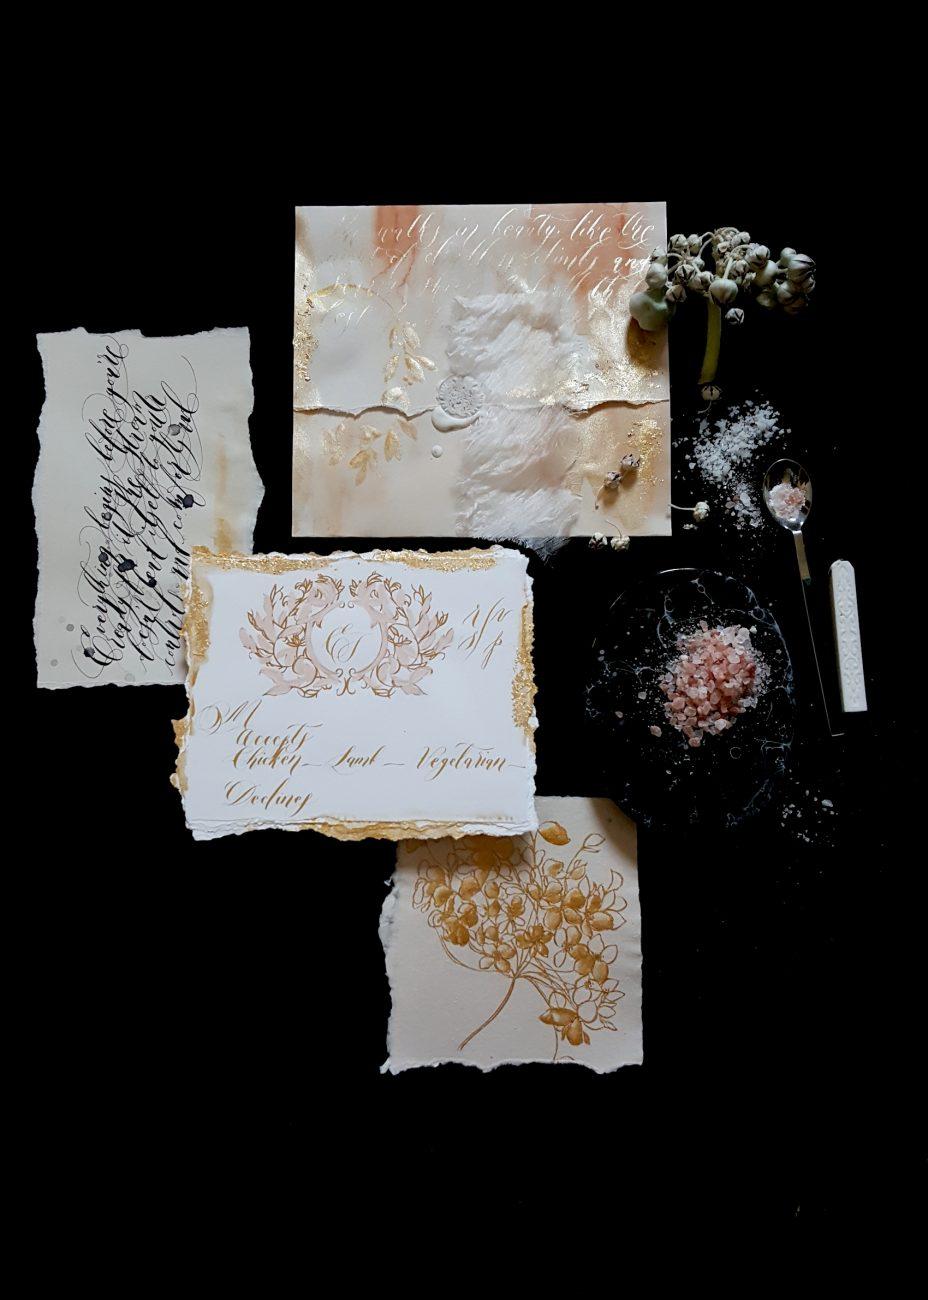 Custom Gold Foil Invitations - Rsvp envelope with gold edges